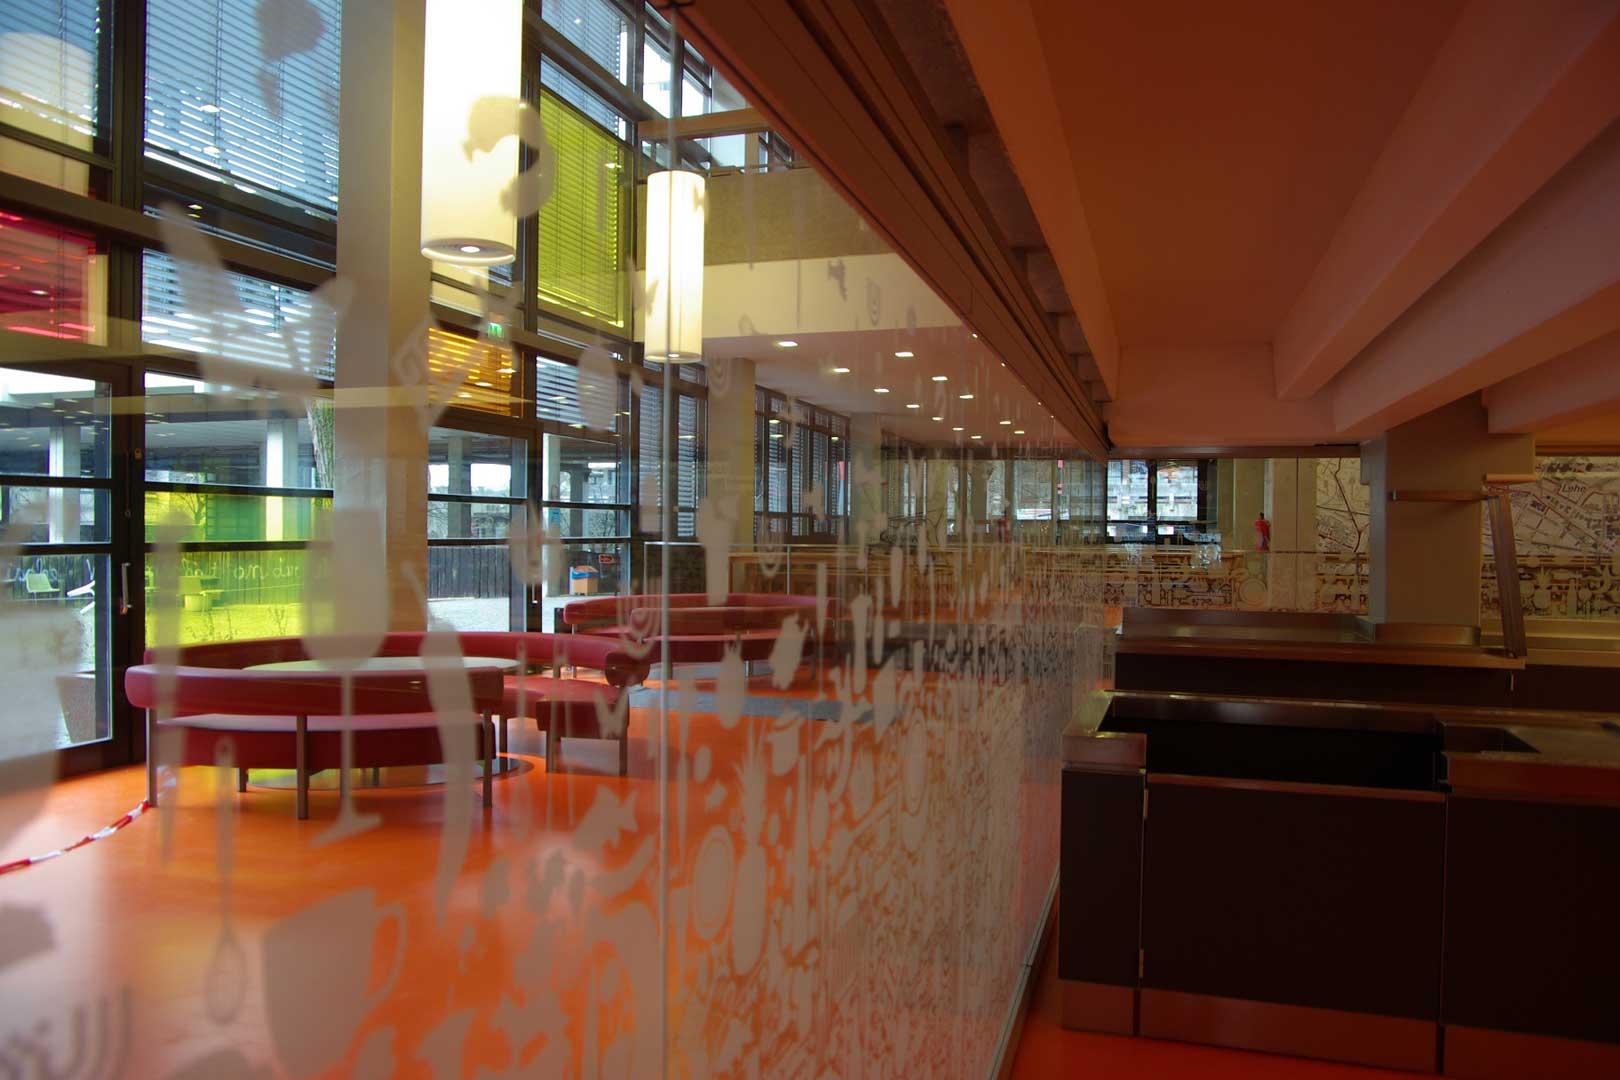 Galeriebild / Universität Bremen, Cafeteria GW2